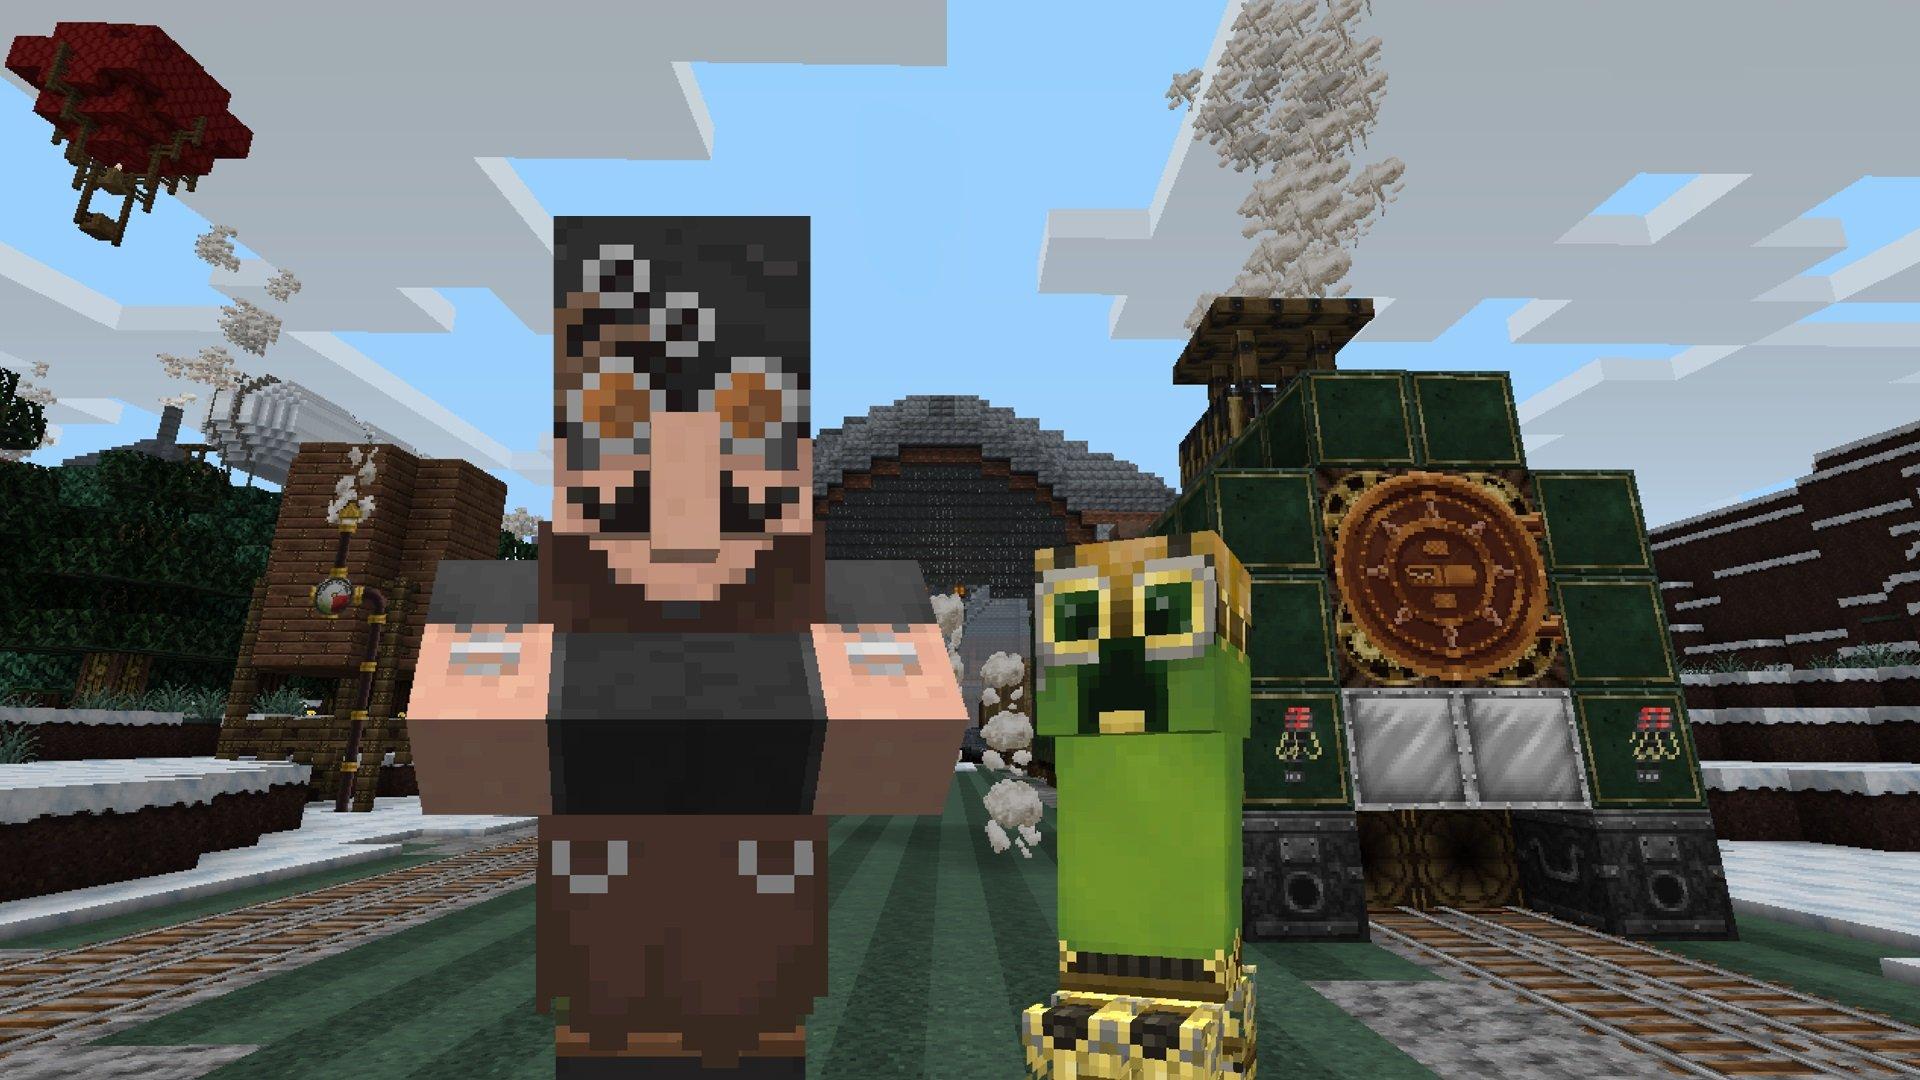 Amazon com: Minecraft: Steampunk Texture Pack - Nintendo Switch